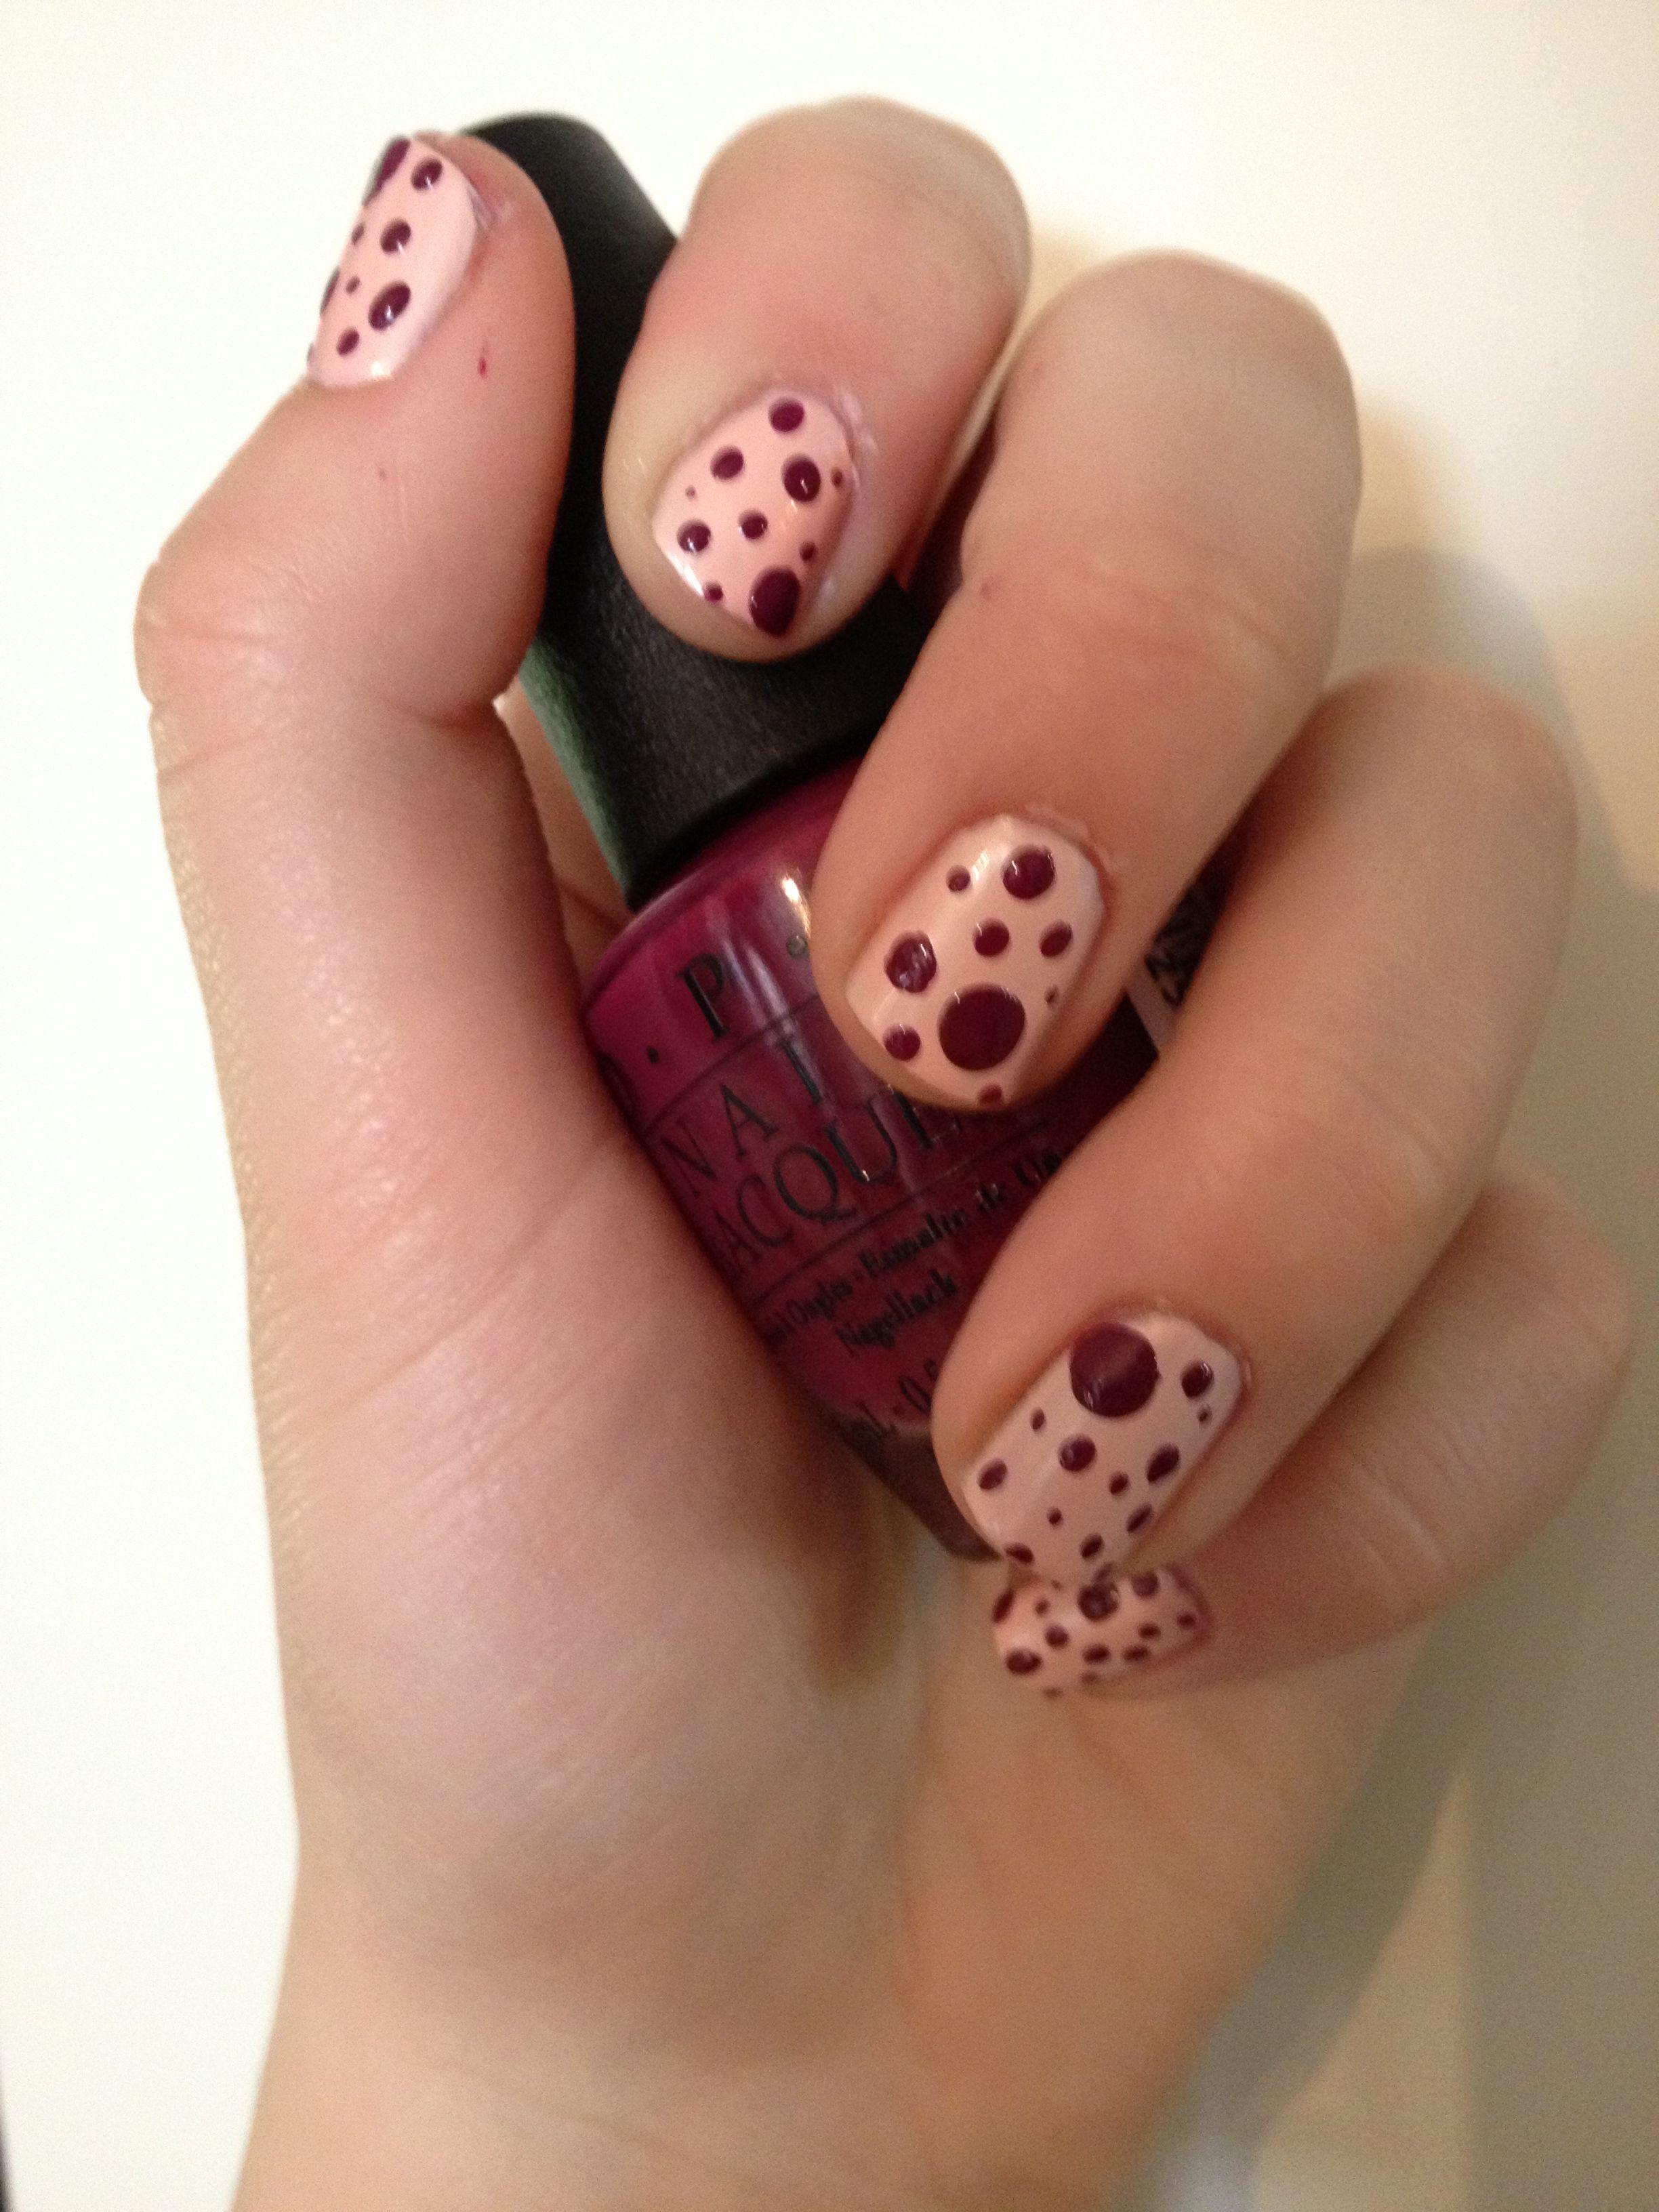 OPI Italian love affair with OPI anti-bleak polka dots. Love the ...